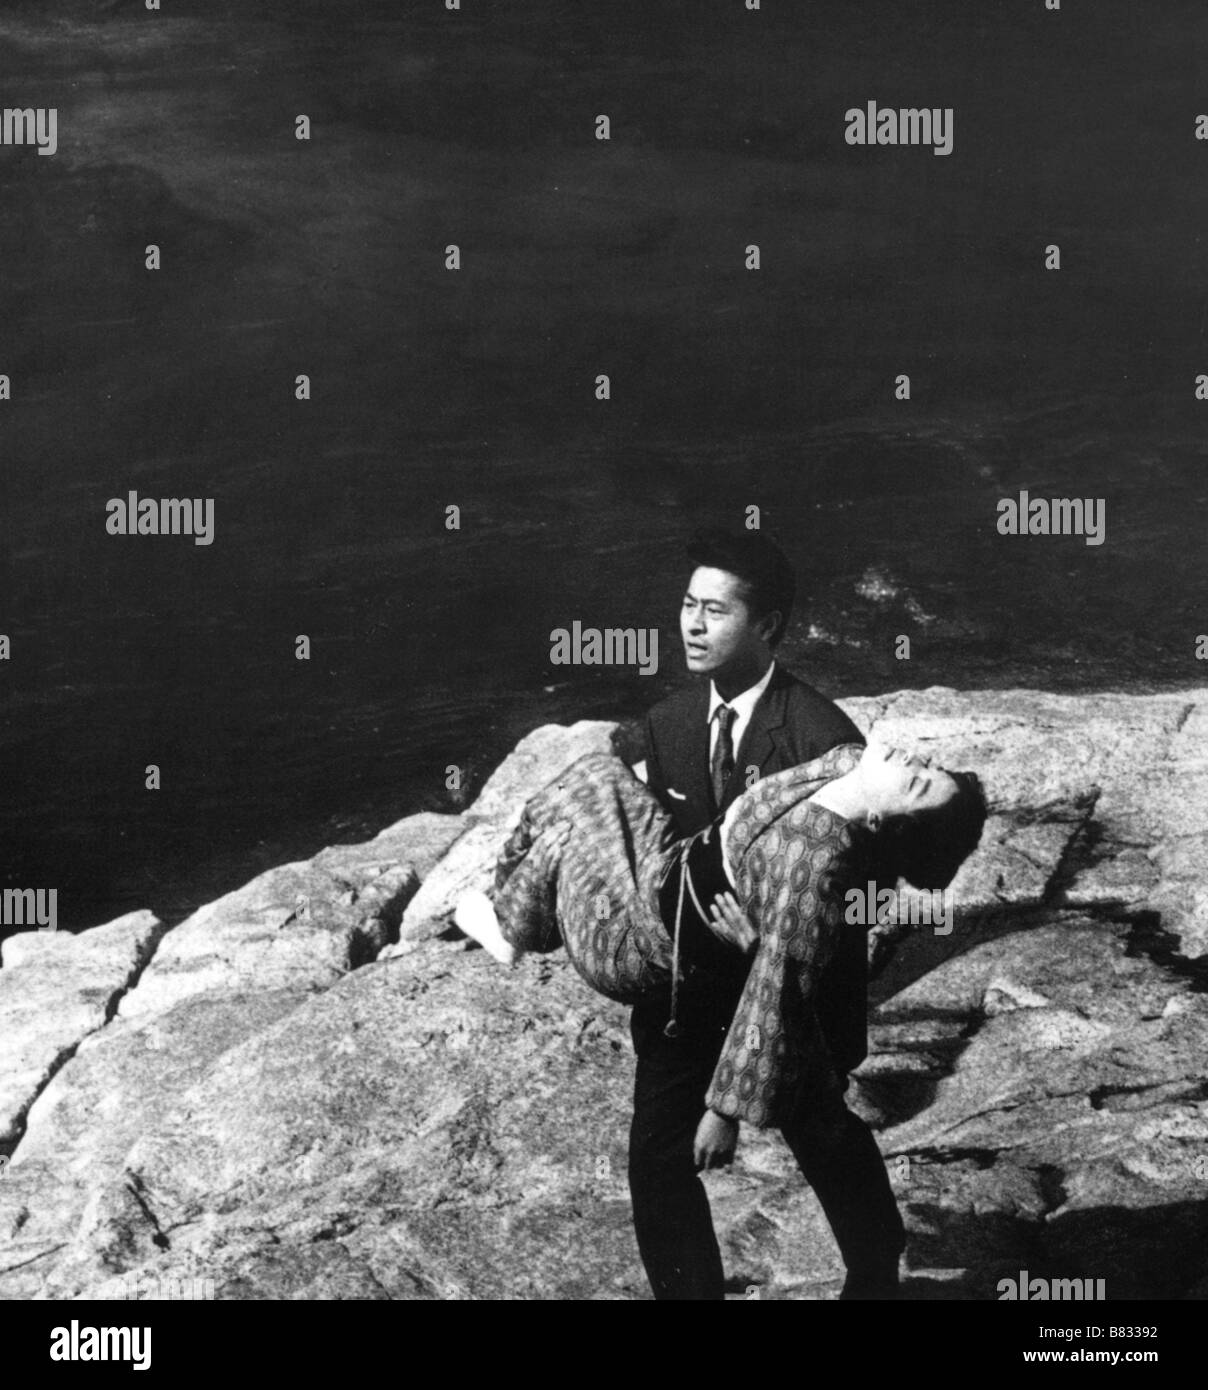 La Source Thermale D Akitsu Akitsu Onsen Year 1962 Japan Mariko Stock Photo Alamy